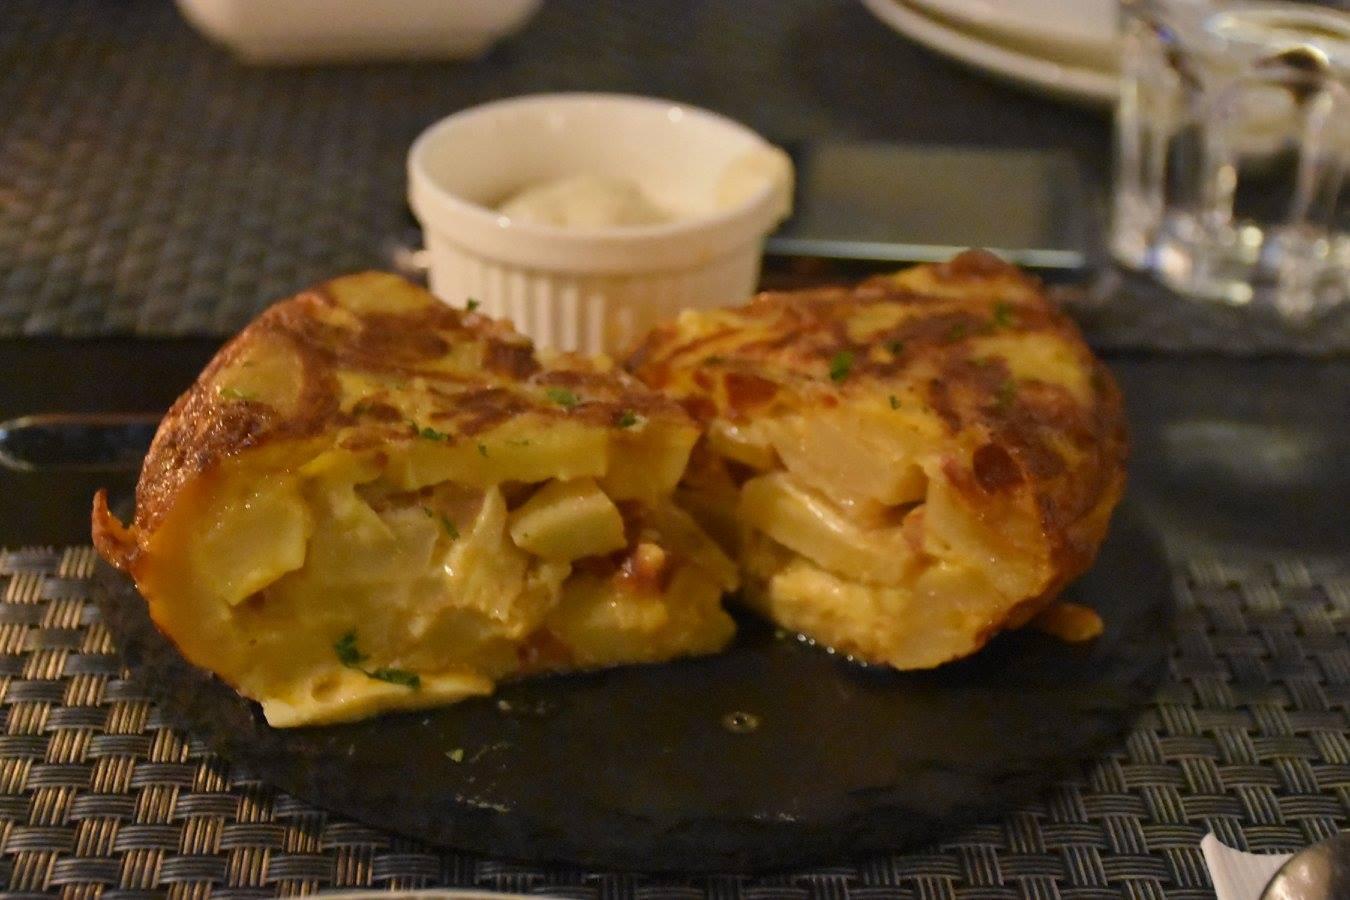 Welcome to Dailyfeedman Blogs 歡迎蒞臨饞餵人網誌: 吃在天后的西班牙菜